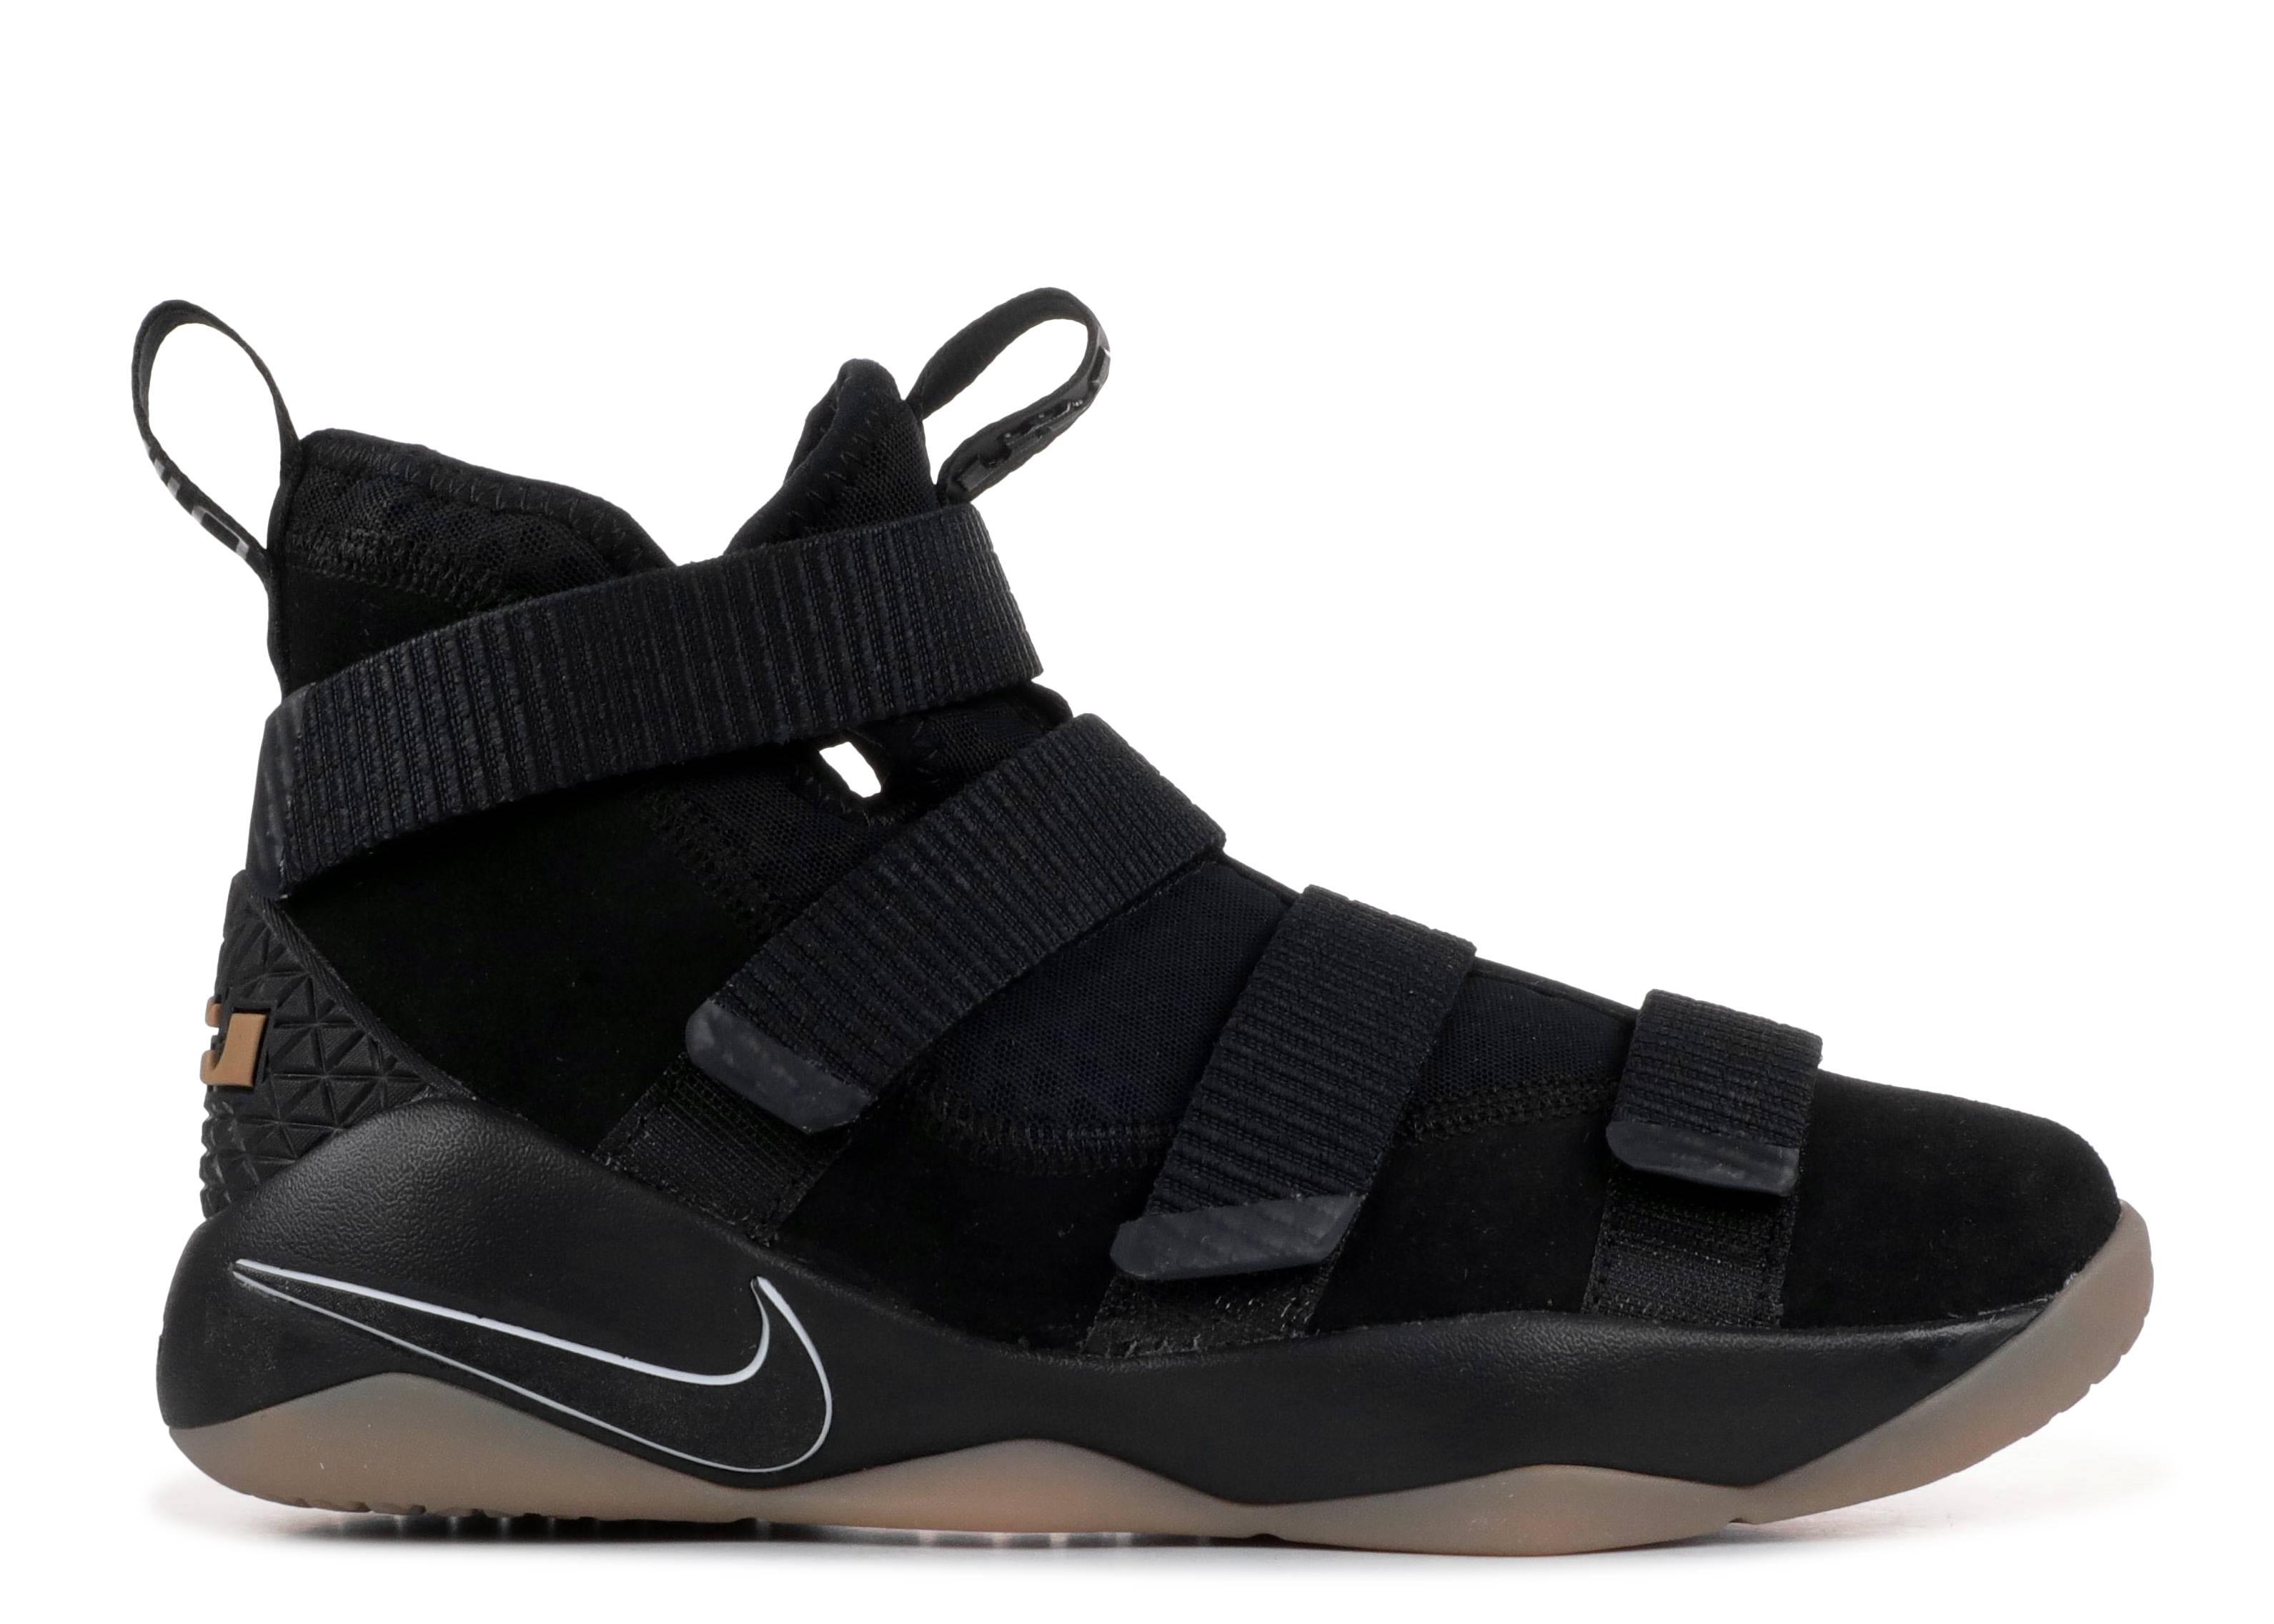 b73a9617c6ca Nike Lebron Soldier Xi - Nike - 918369 007 - black gum